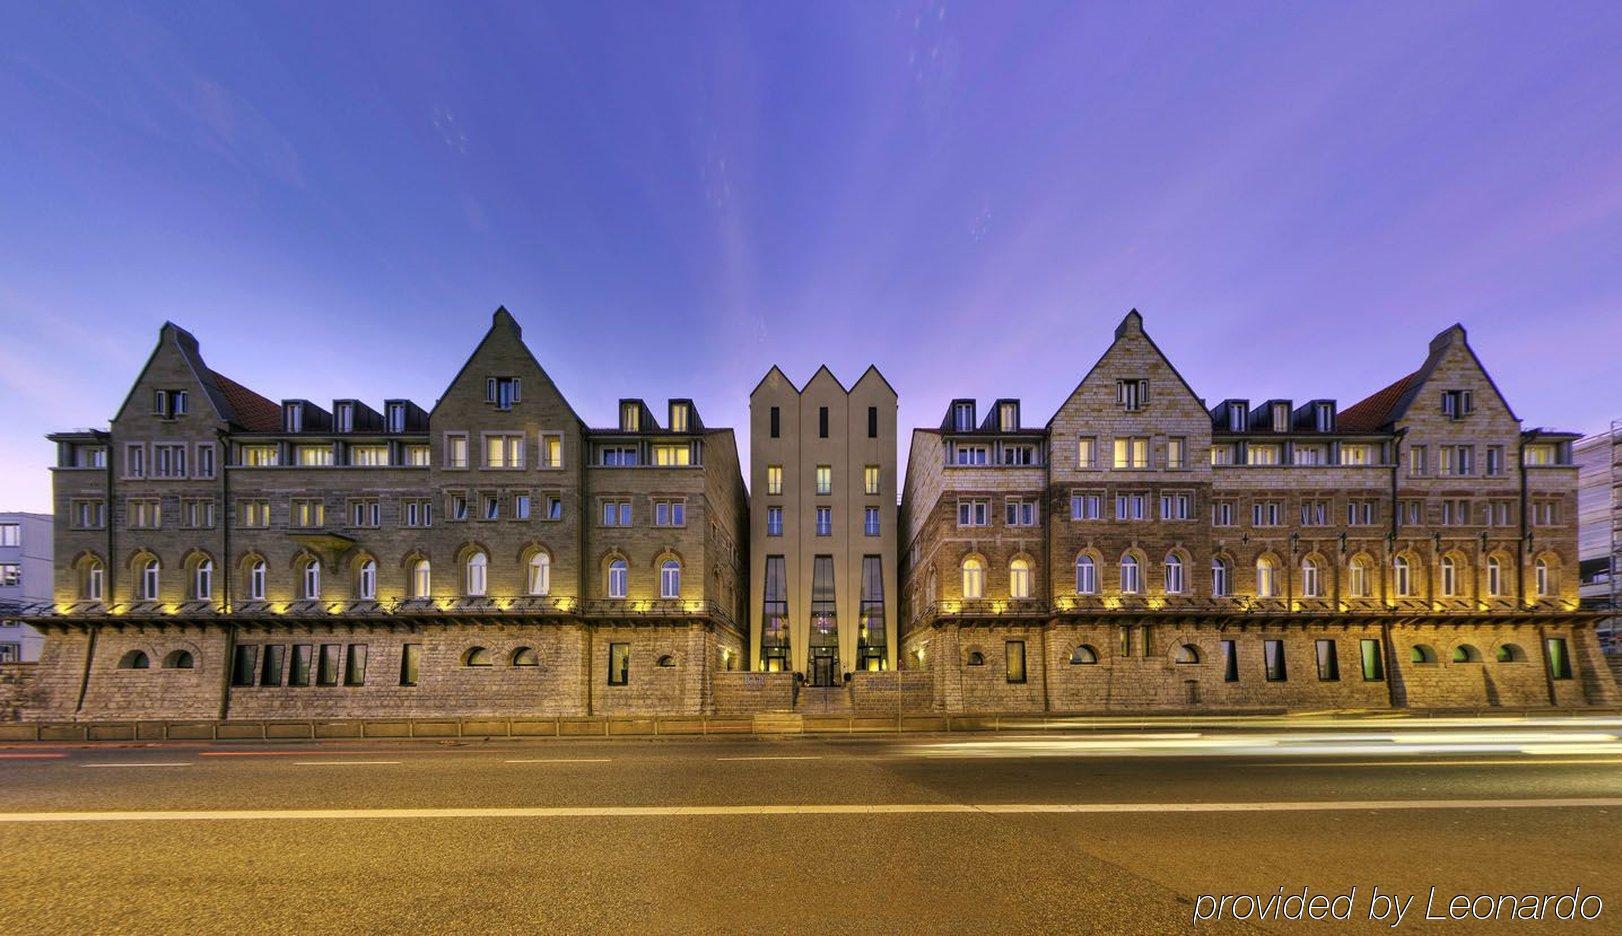 Hotel arcotel camino stuttgart for Hotels close to mercedes benz superdome